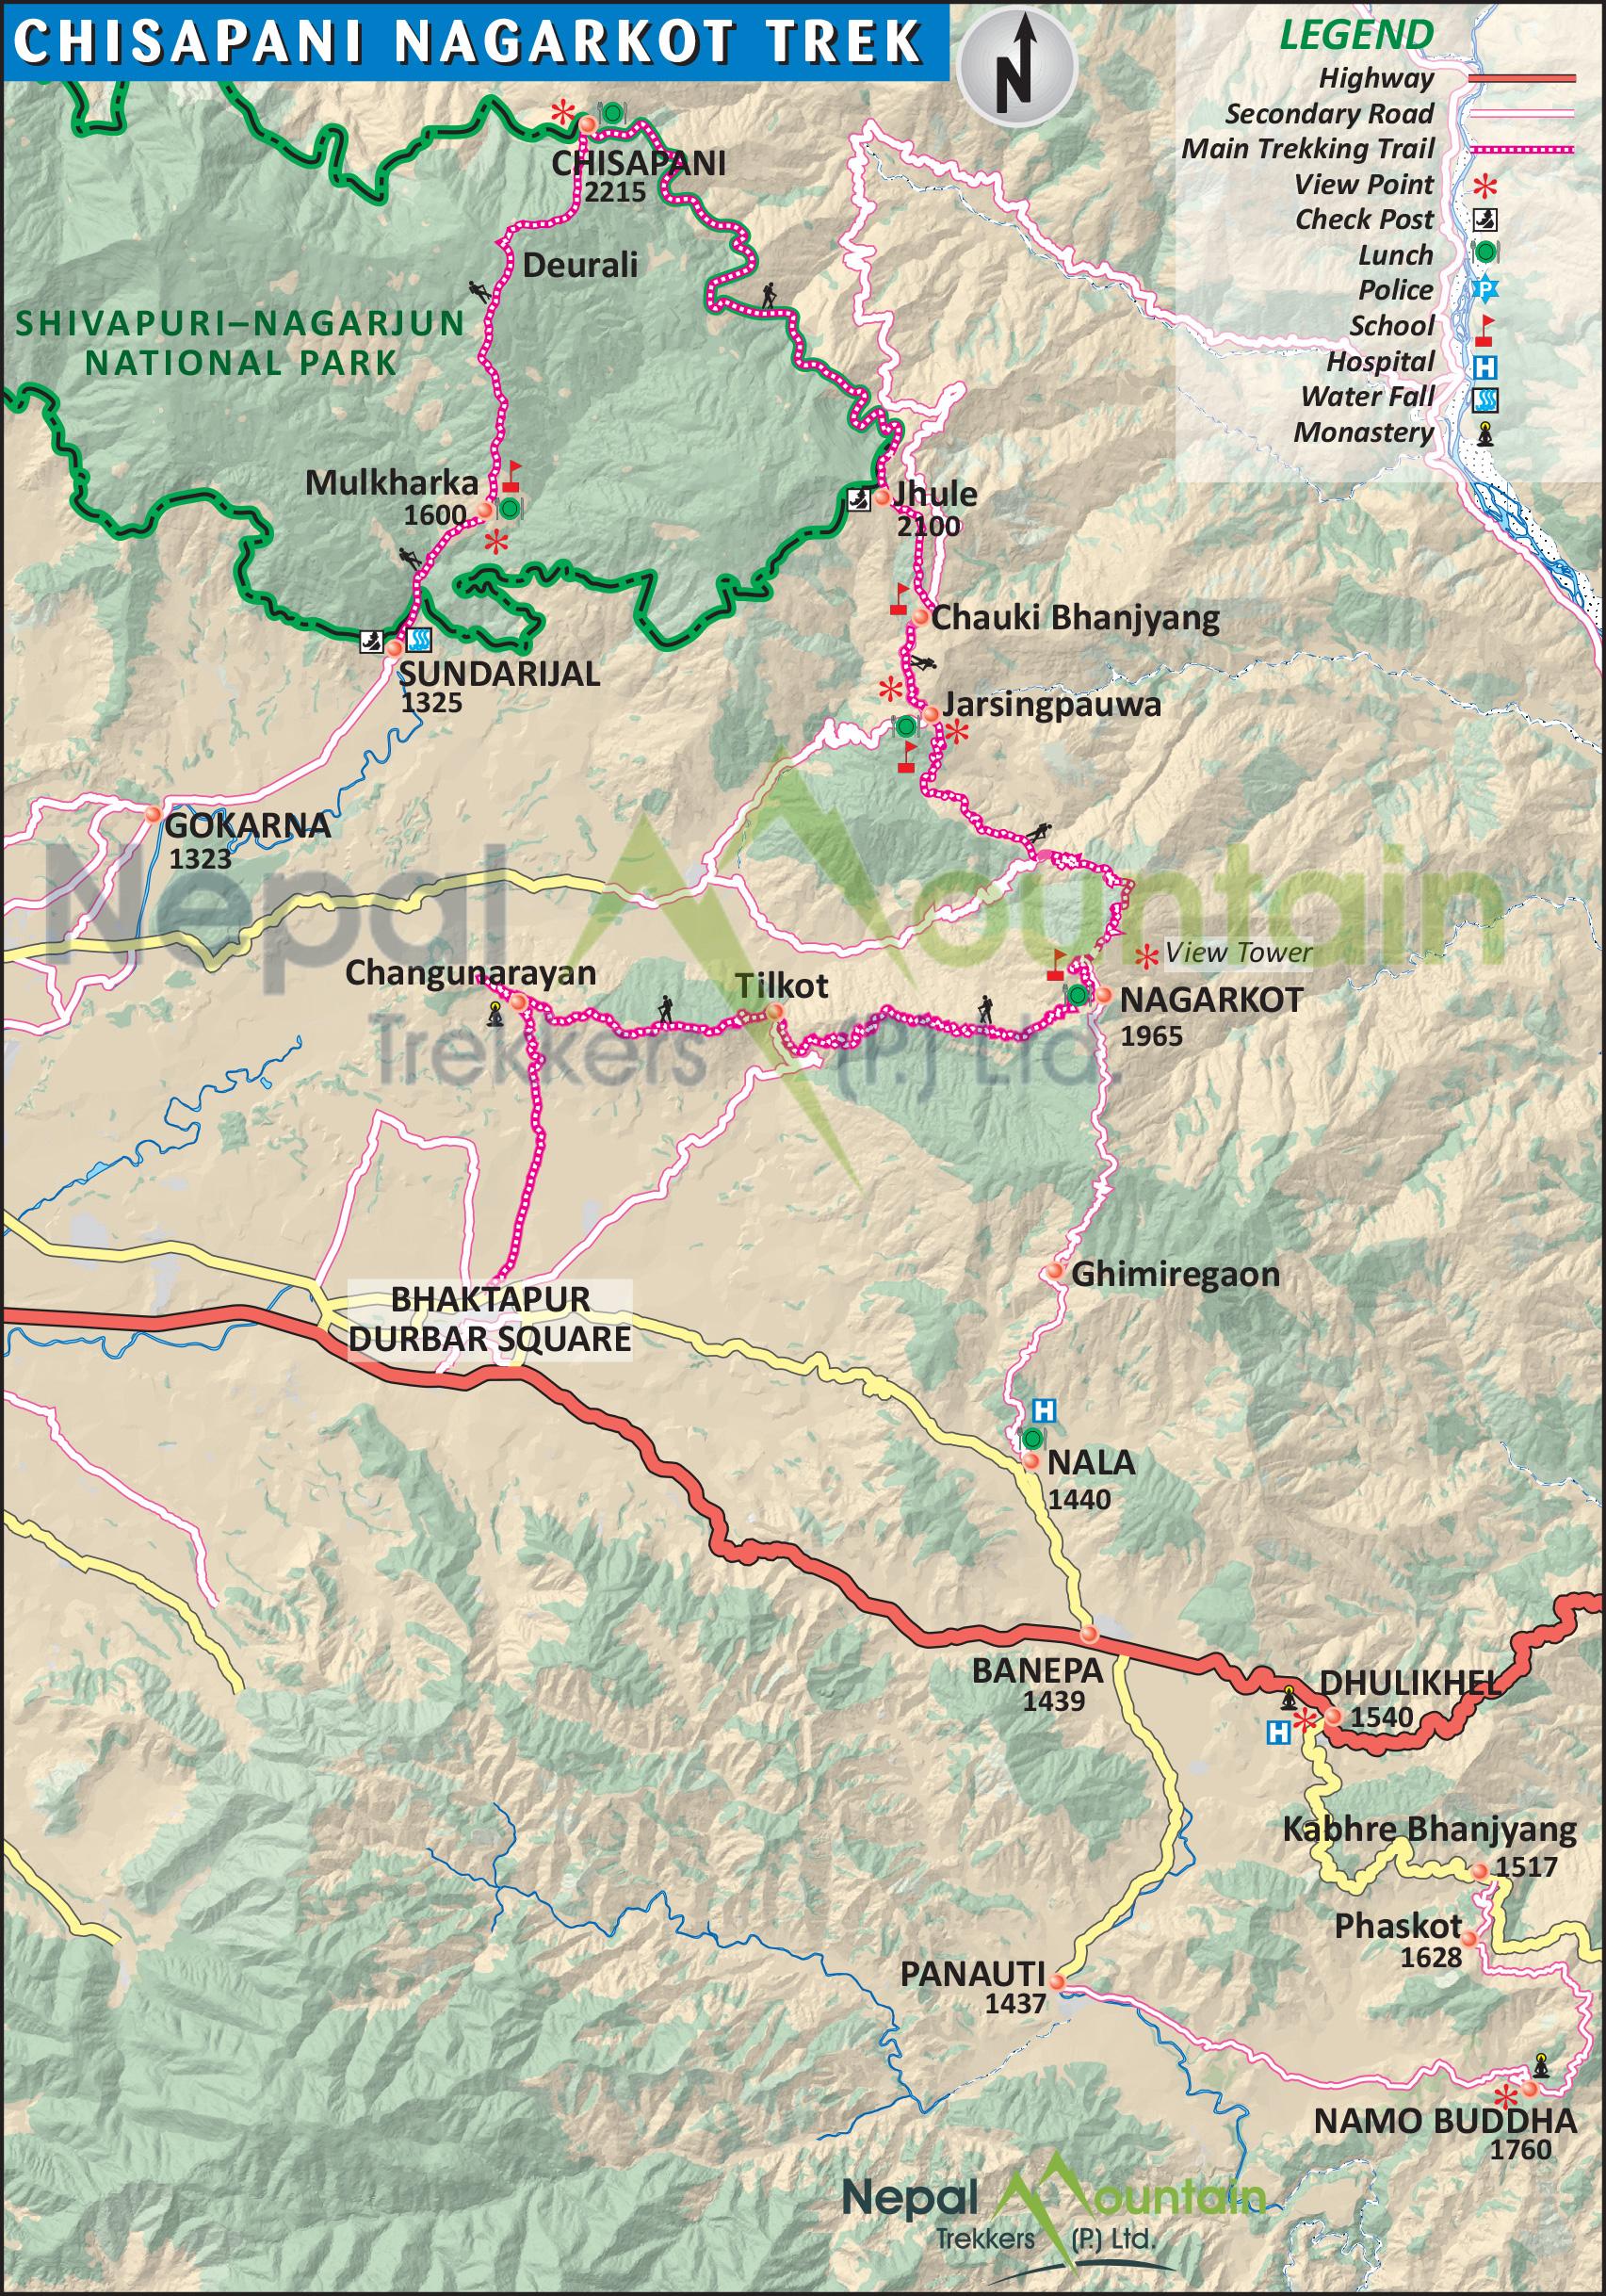 map of Chisapani Nagarkot Trekking